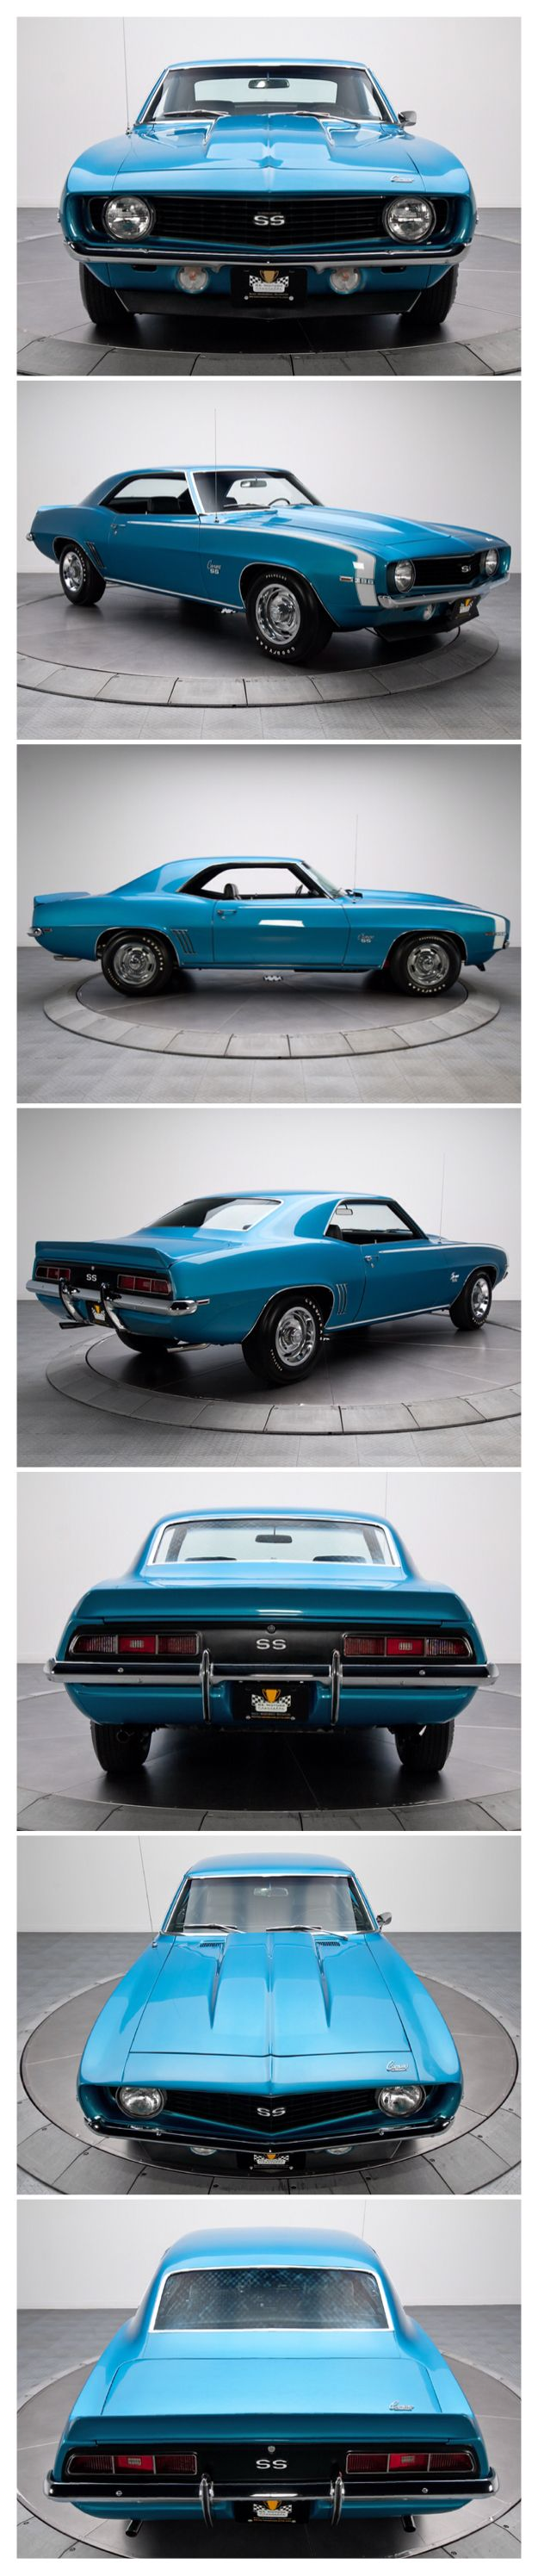 Chevrolet Camaro SS 1969.